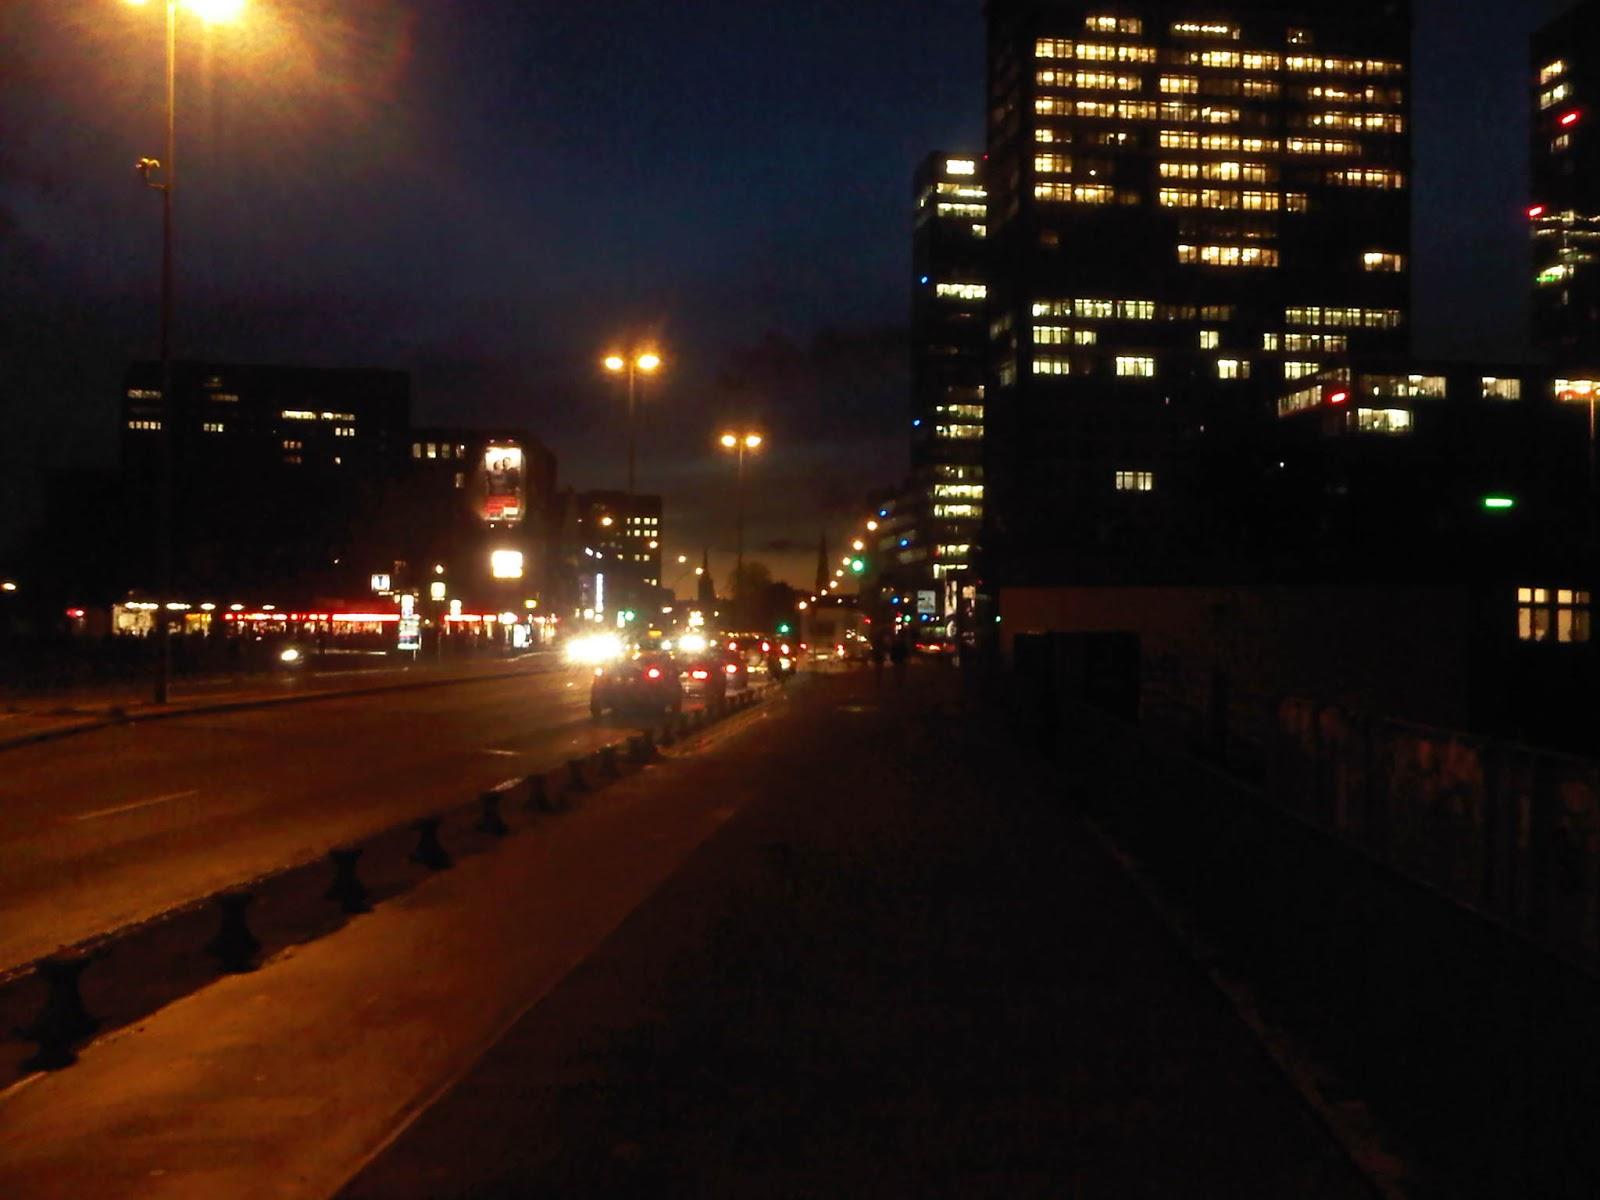 IBM-Türme bei Nacht - Berliner Tor - Hamburg